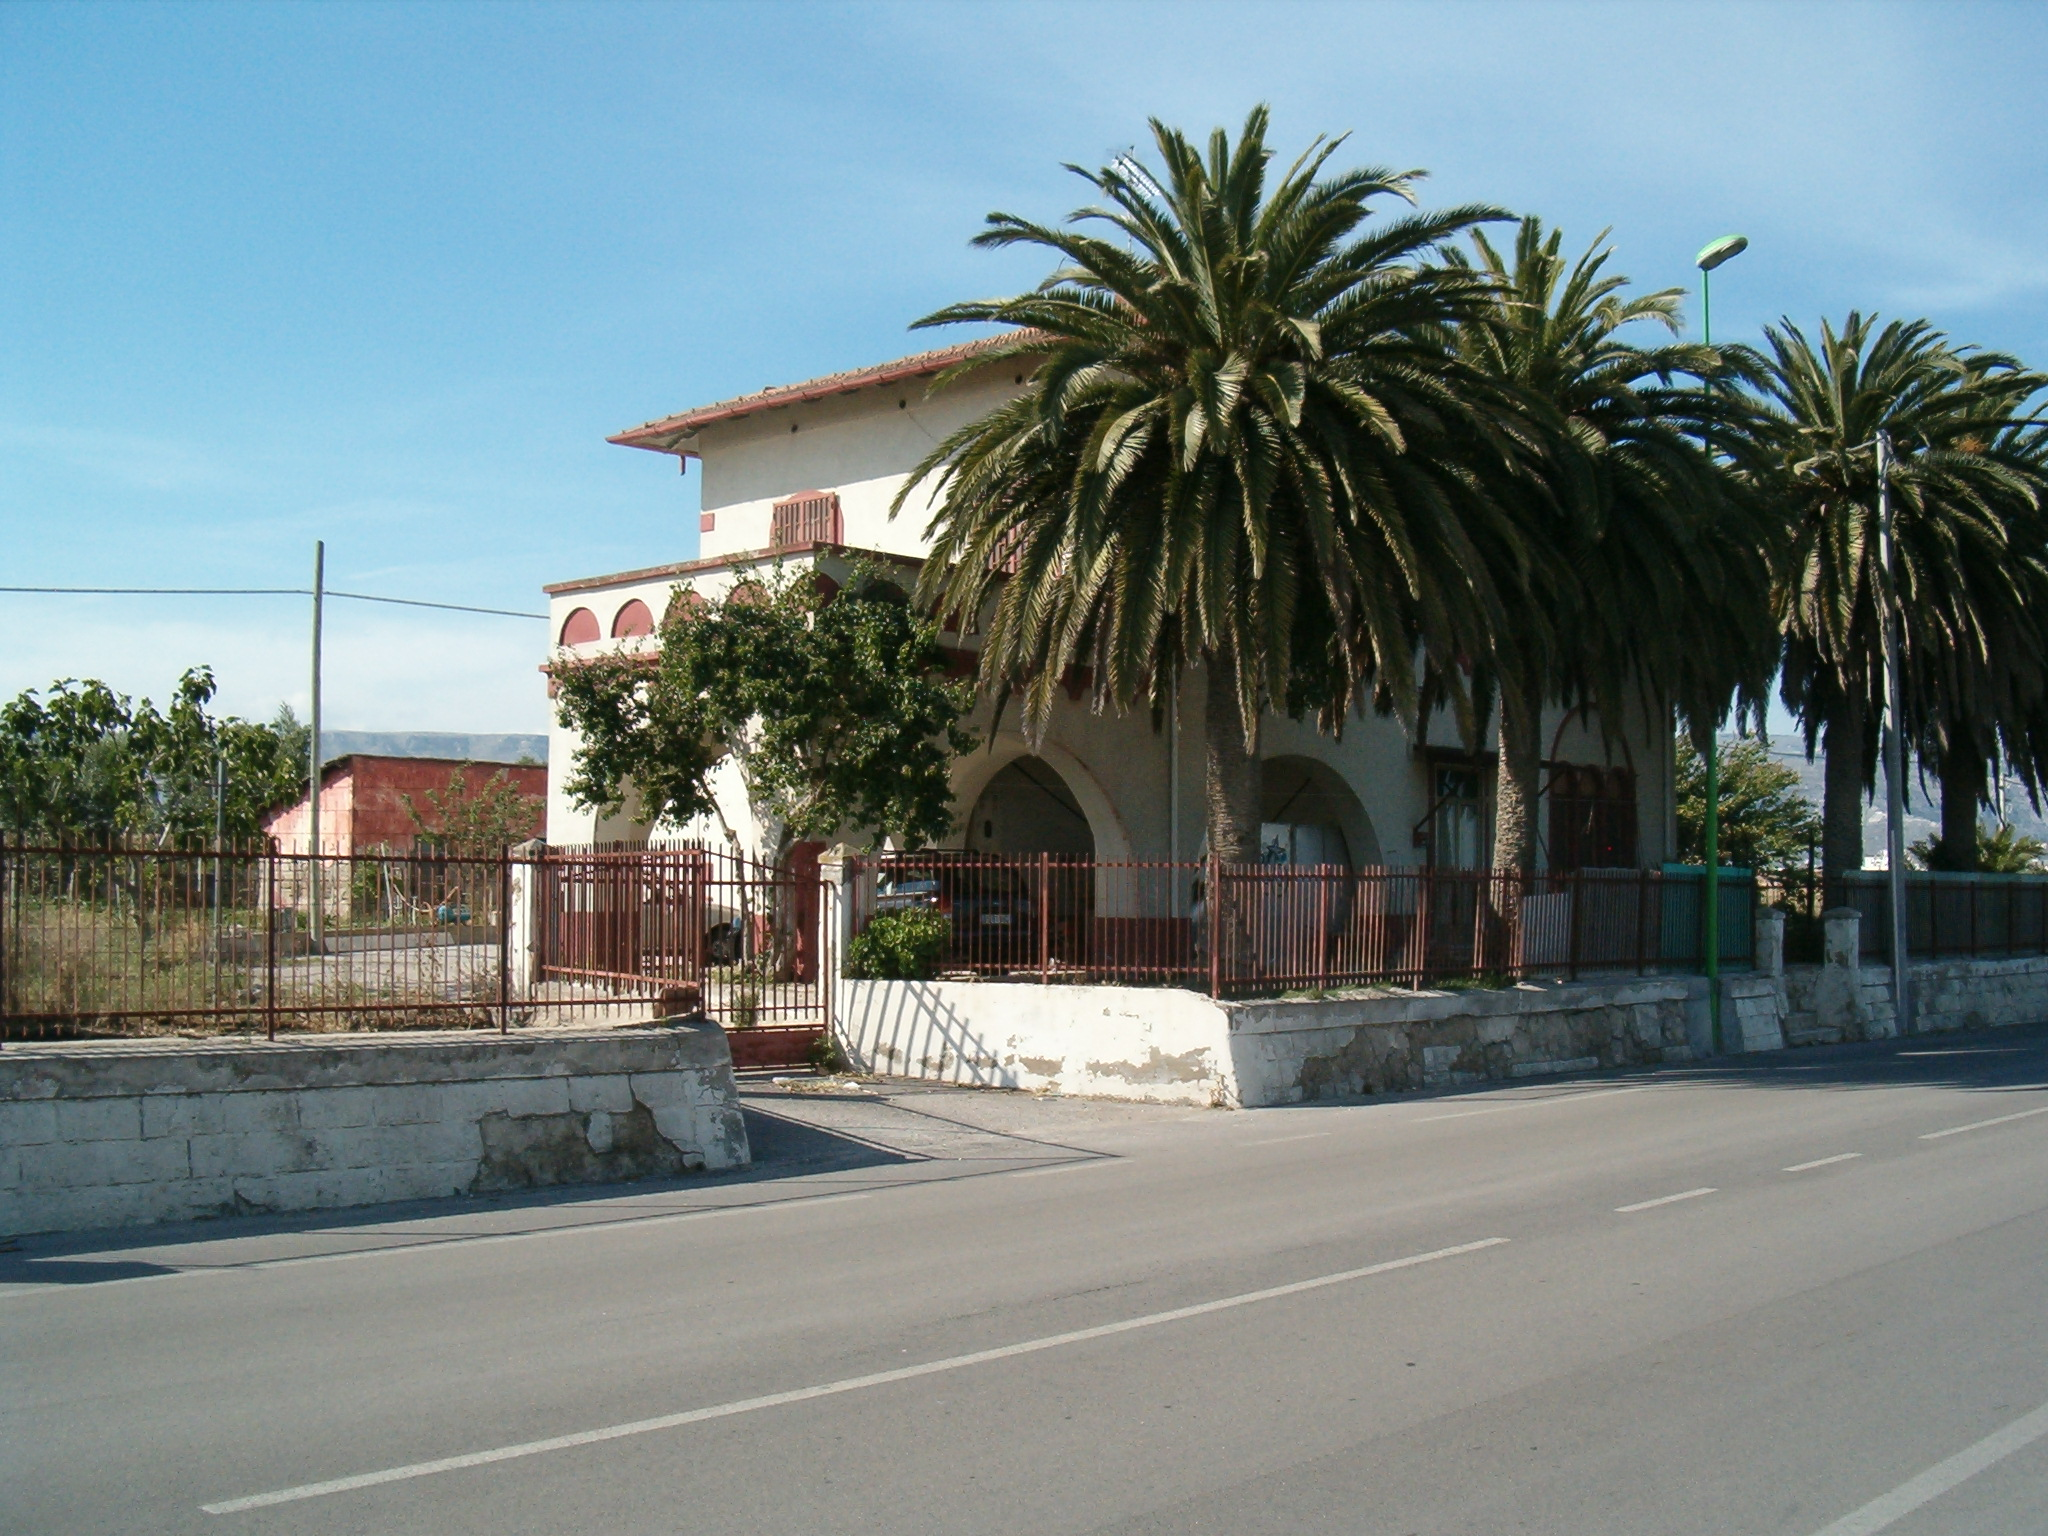 Casa cantoniera Manfredonia / Anas